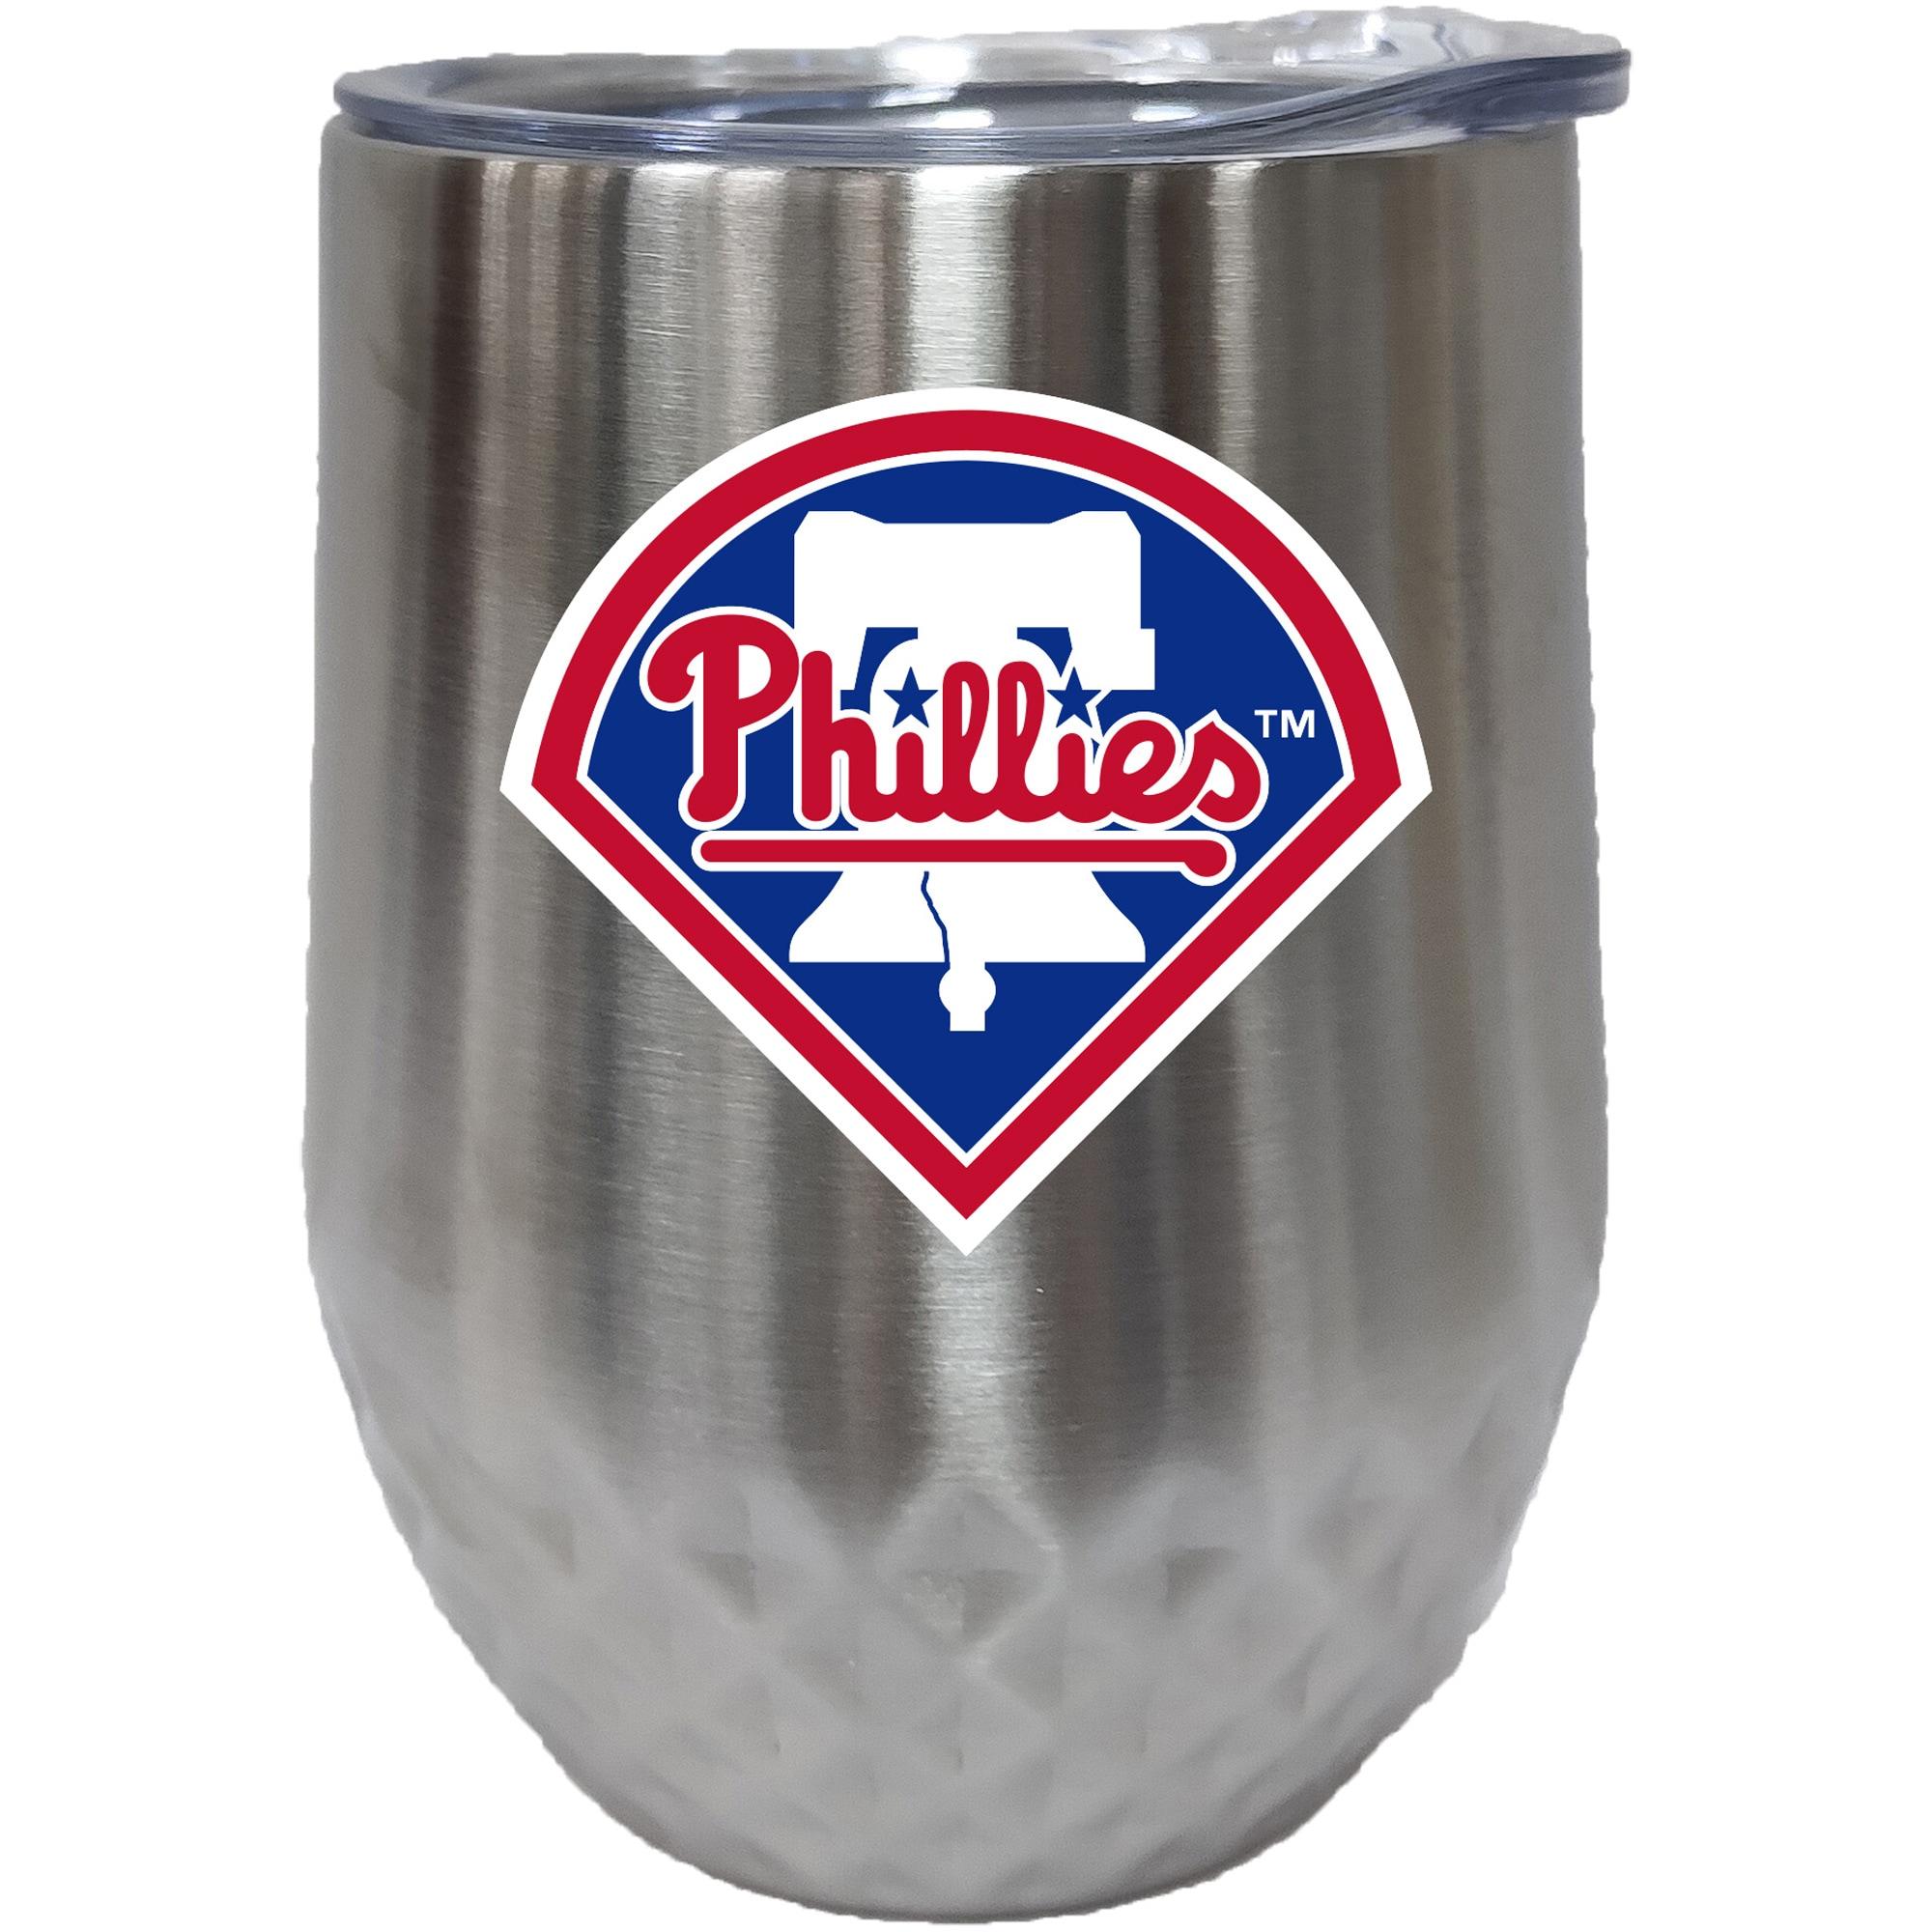 Philadelphia Phillies 12oz. Stainless Steel Stemless Diamond Tumbler